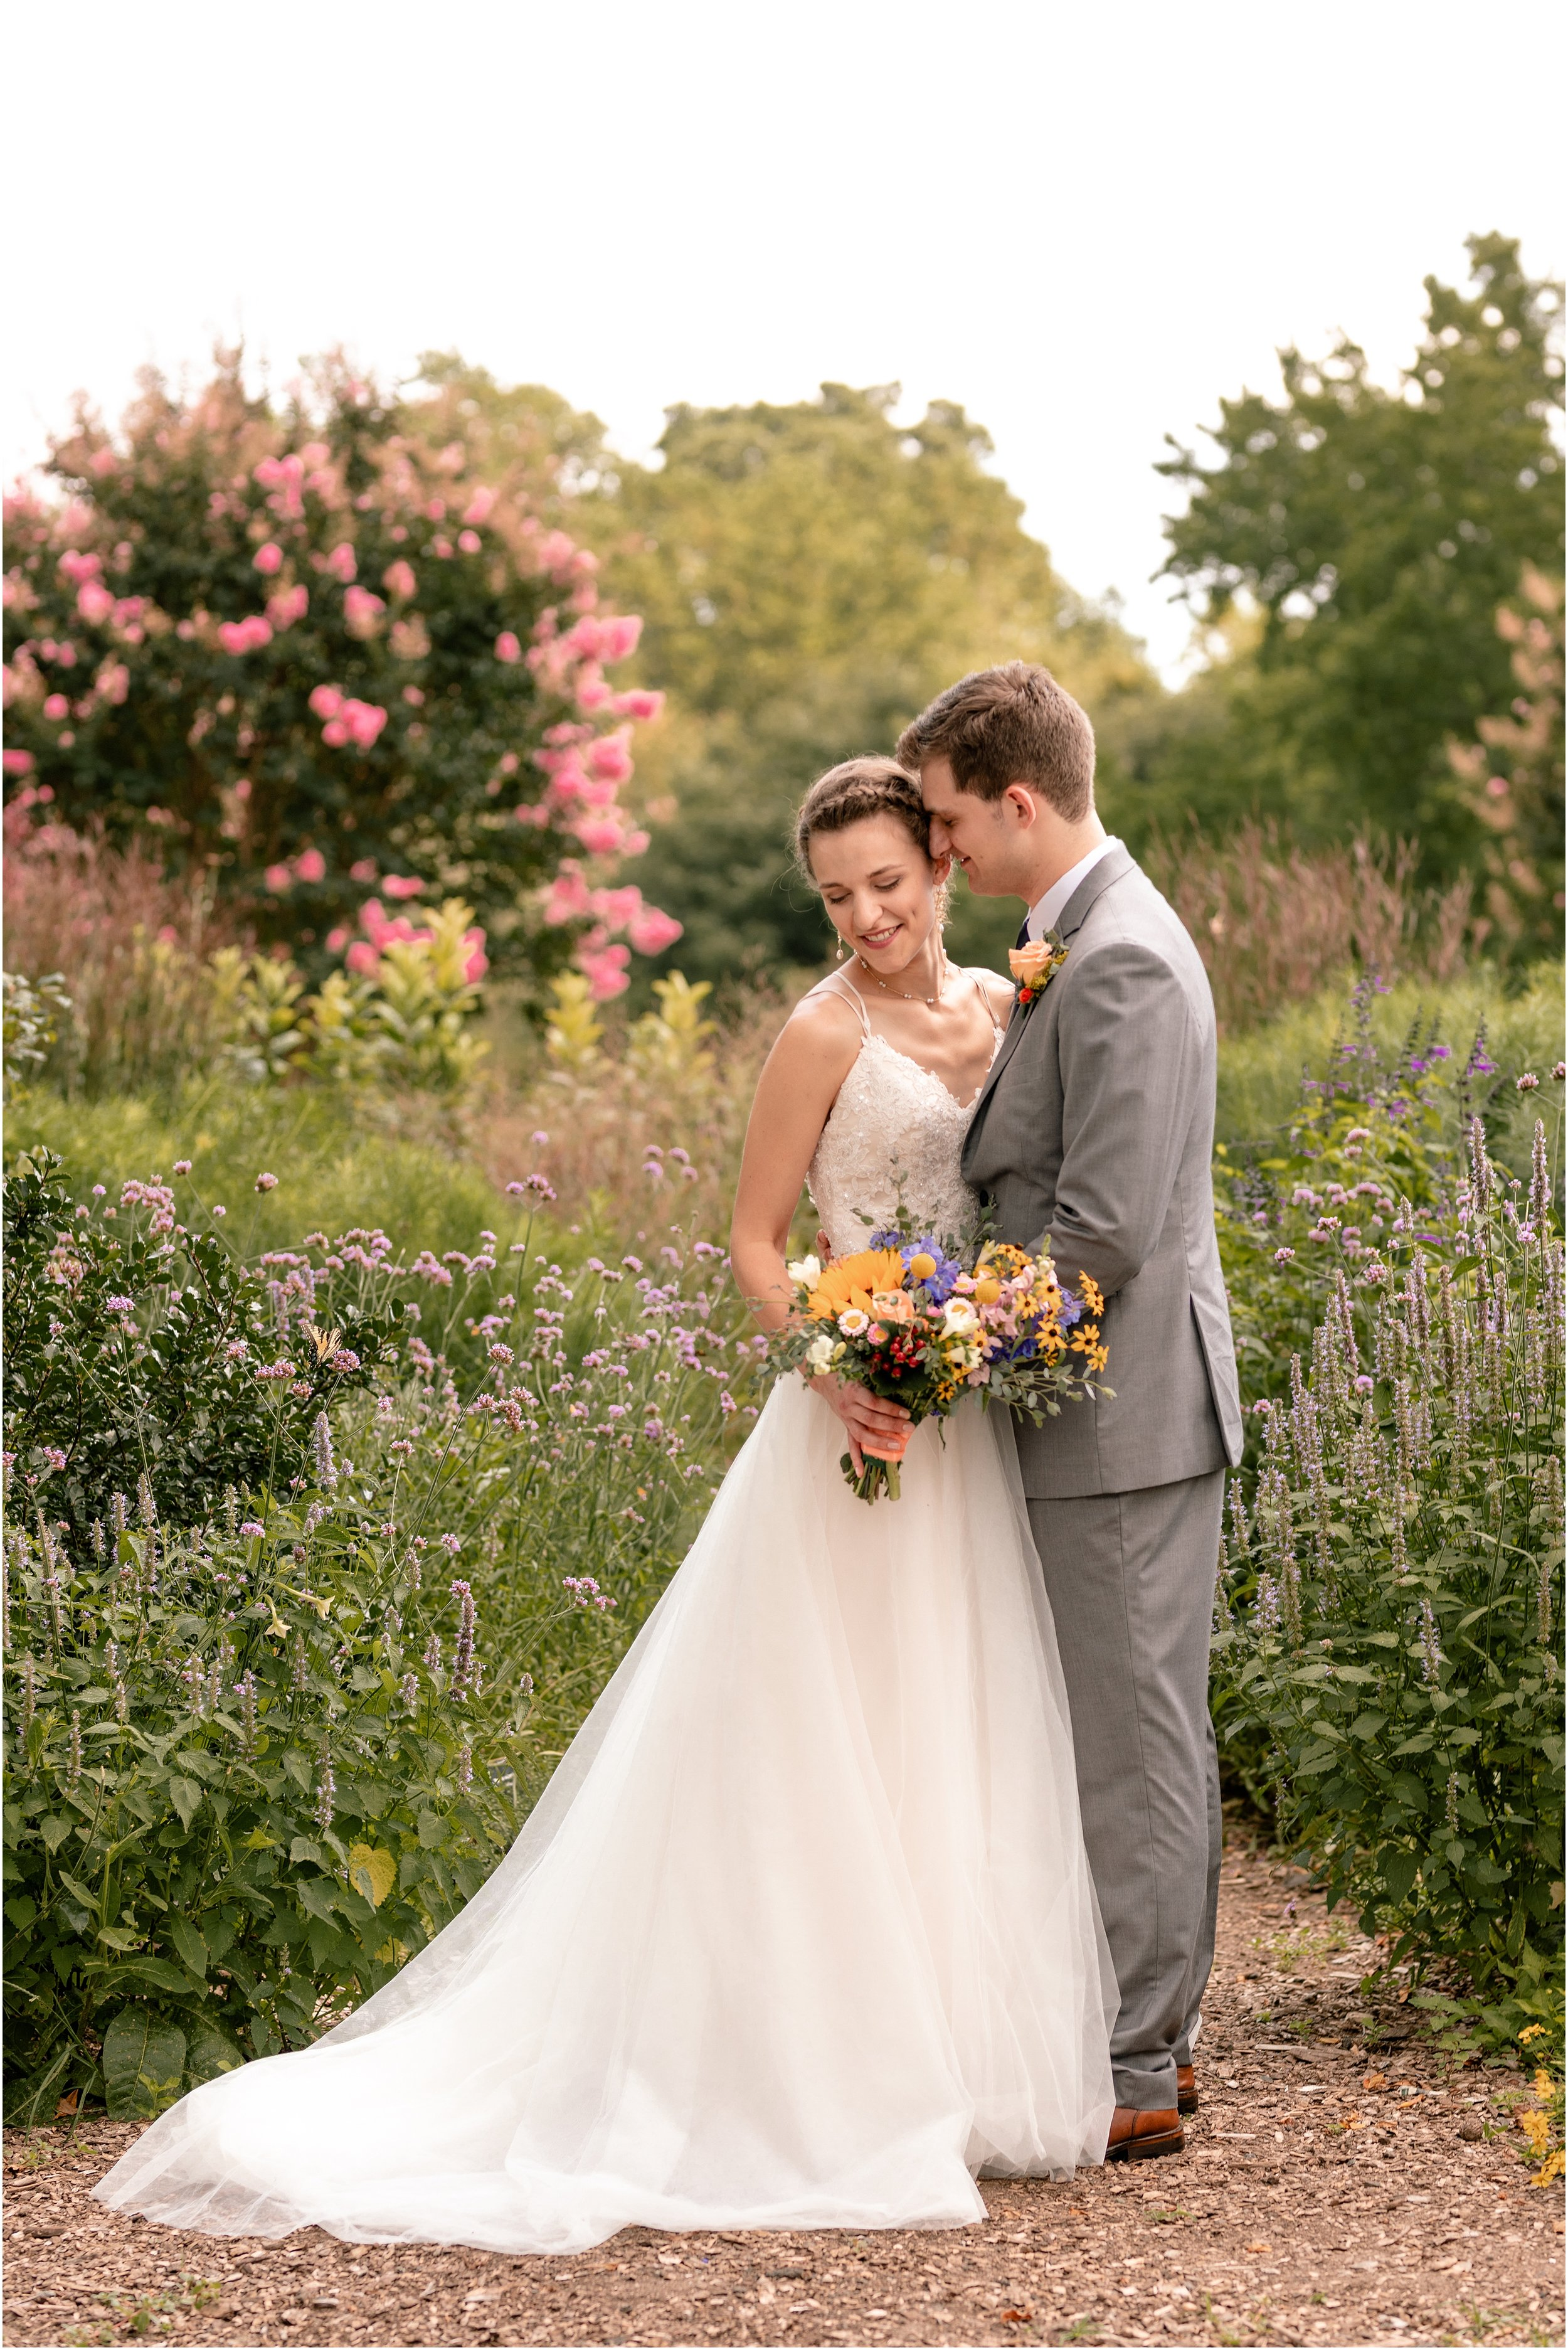 hannah leigh photography Cylburn Arboretum Wedding Baltimore, MD_3419.jpg